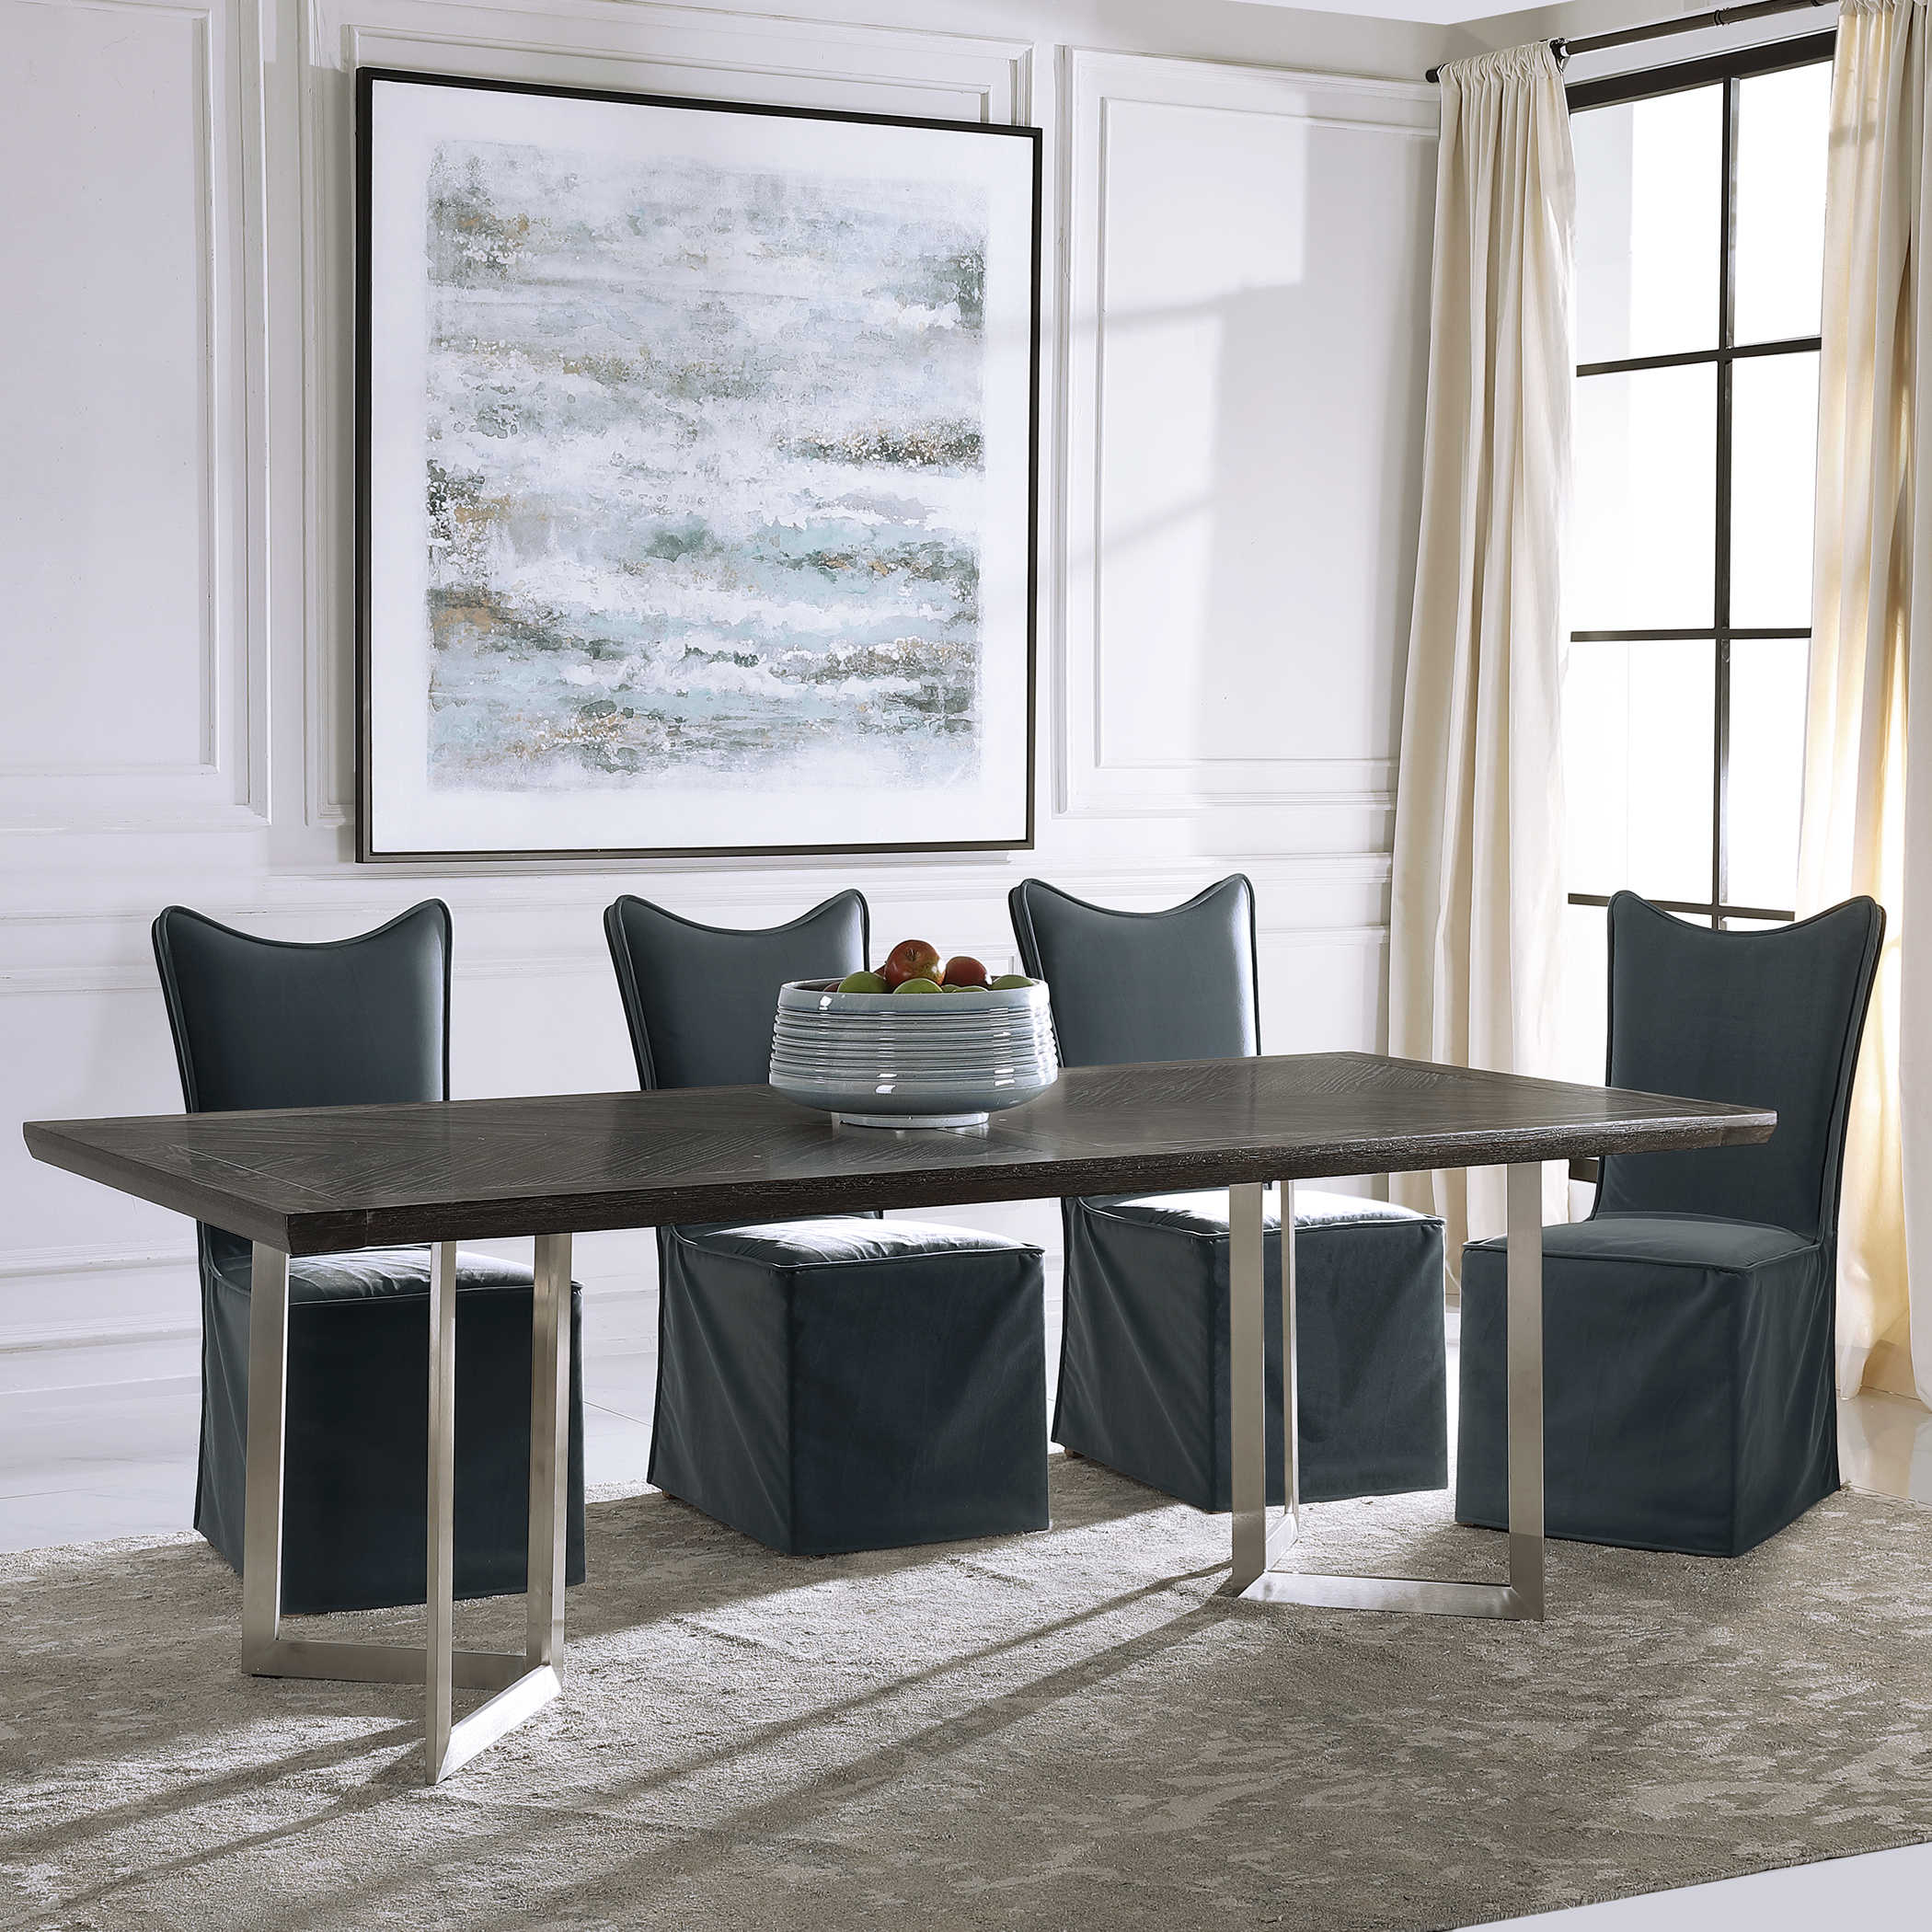 Herringbone Dining Table 2 Cartons, Uttermost Dining Room Tables